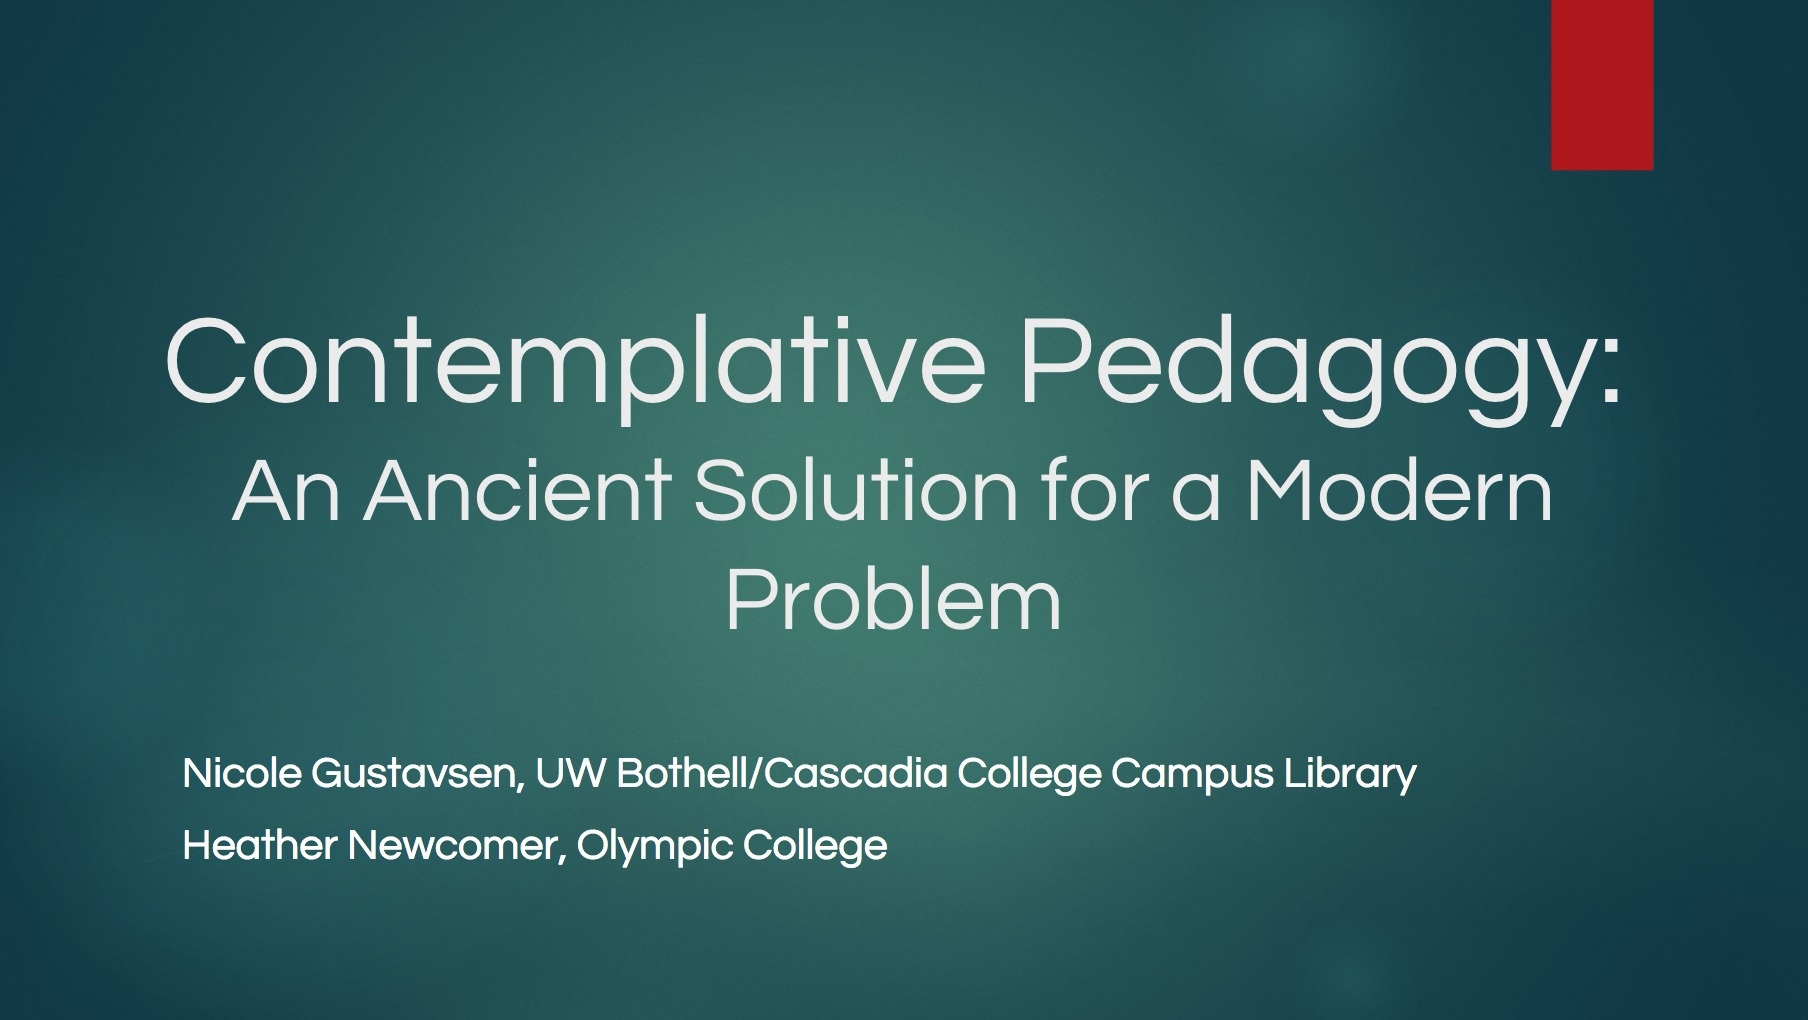 Title Slide from Contemplative Pedagogy Presentation